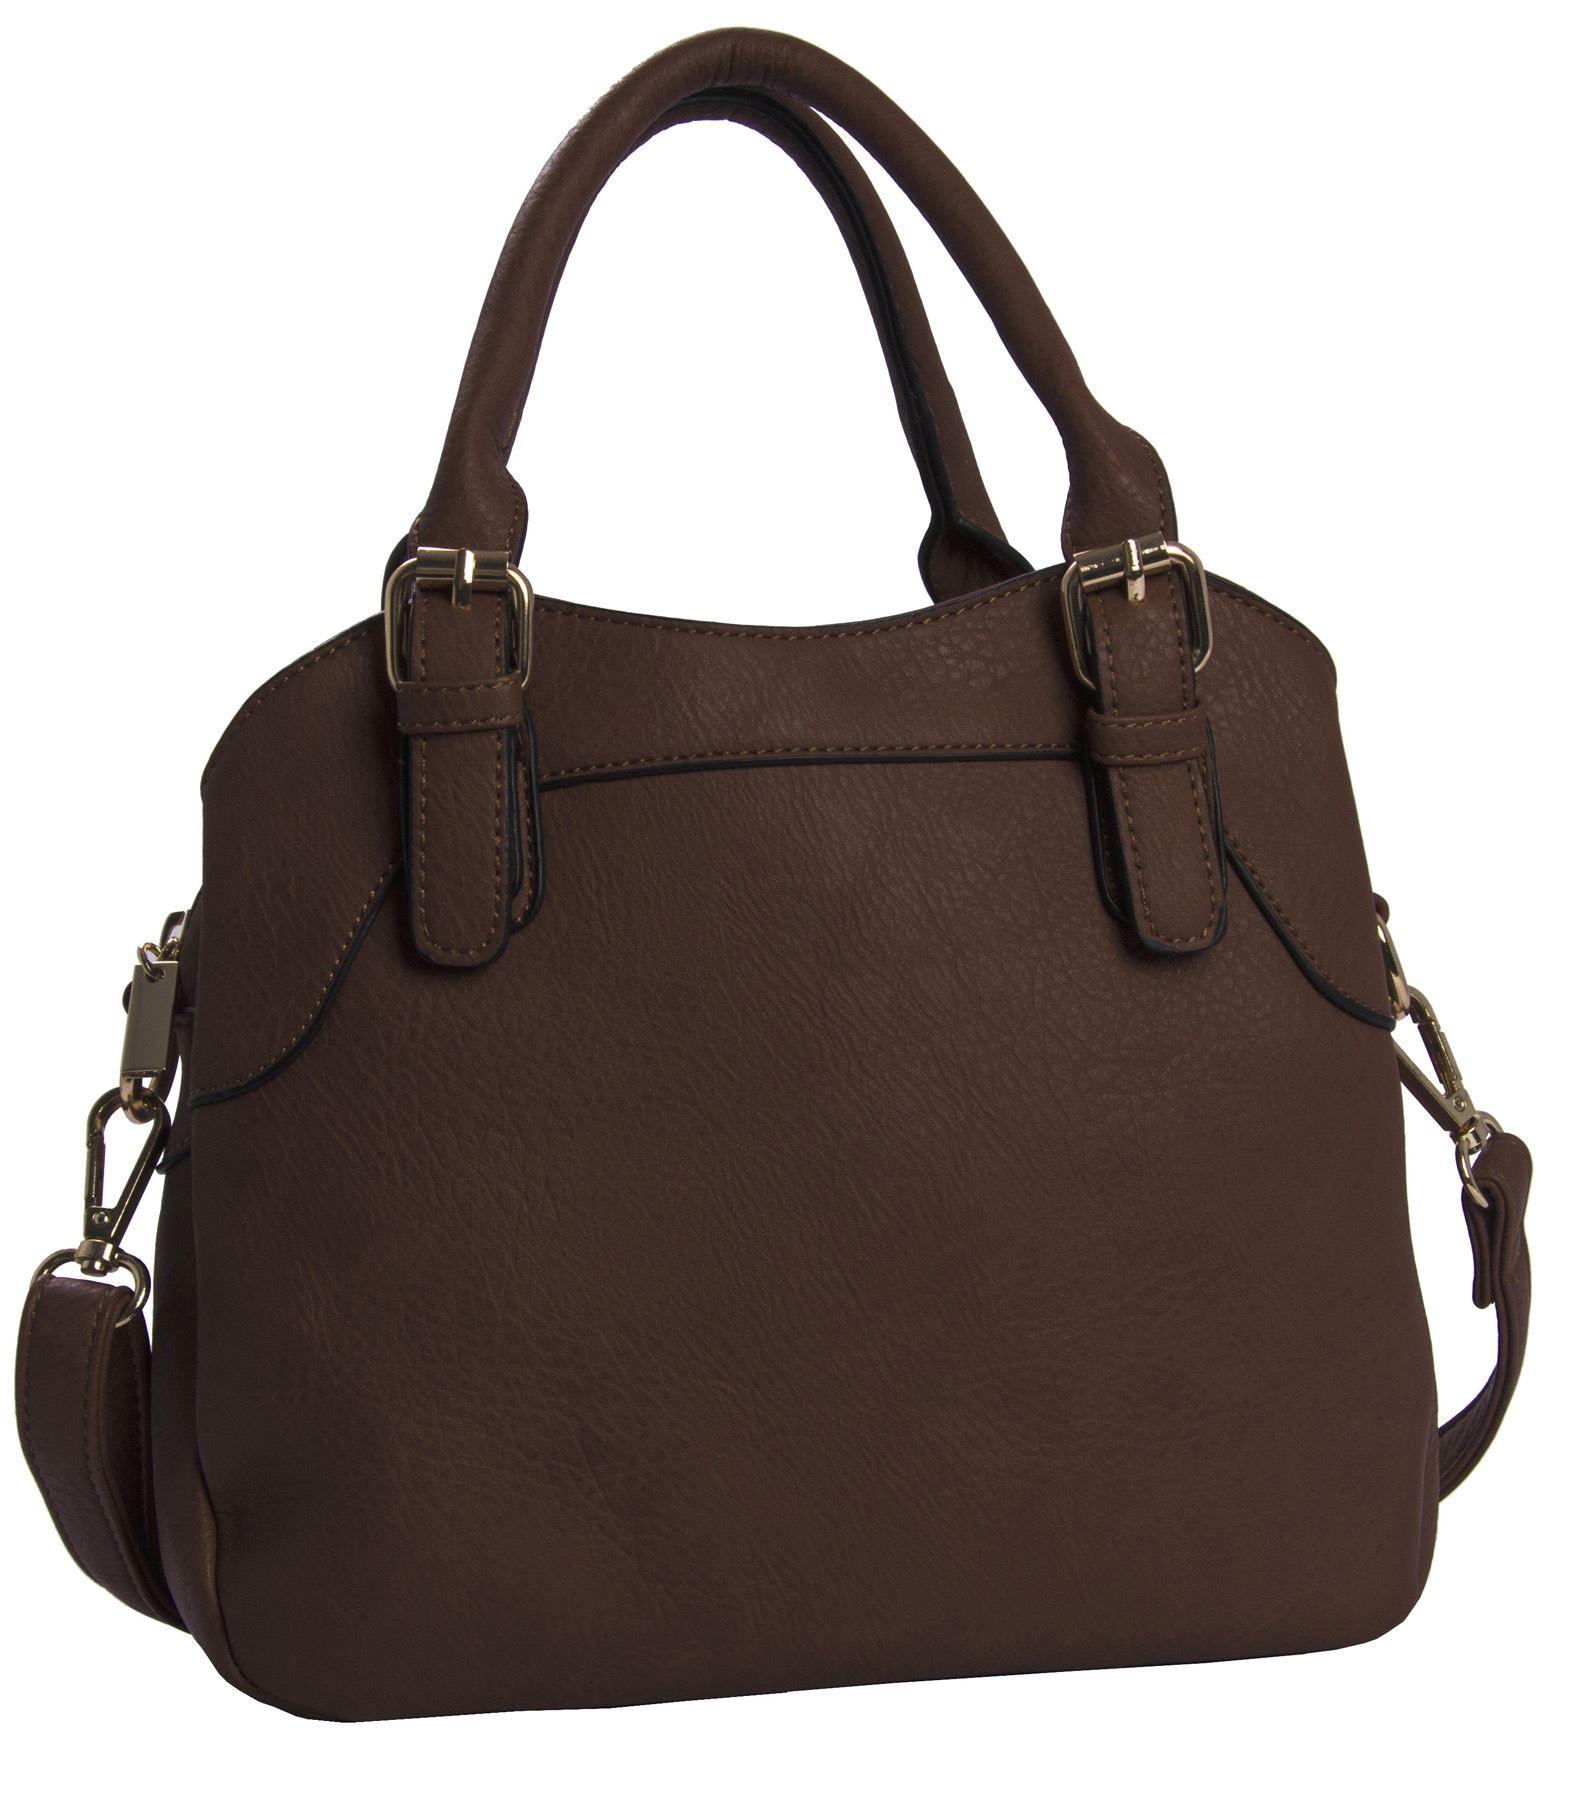 Big Handbag Shop Womens Faux Leather Designer Top Handle Satchel Bag